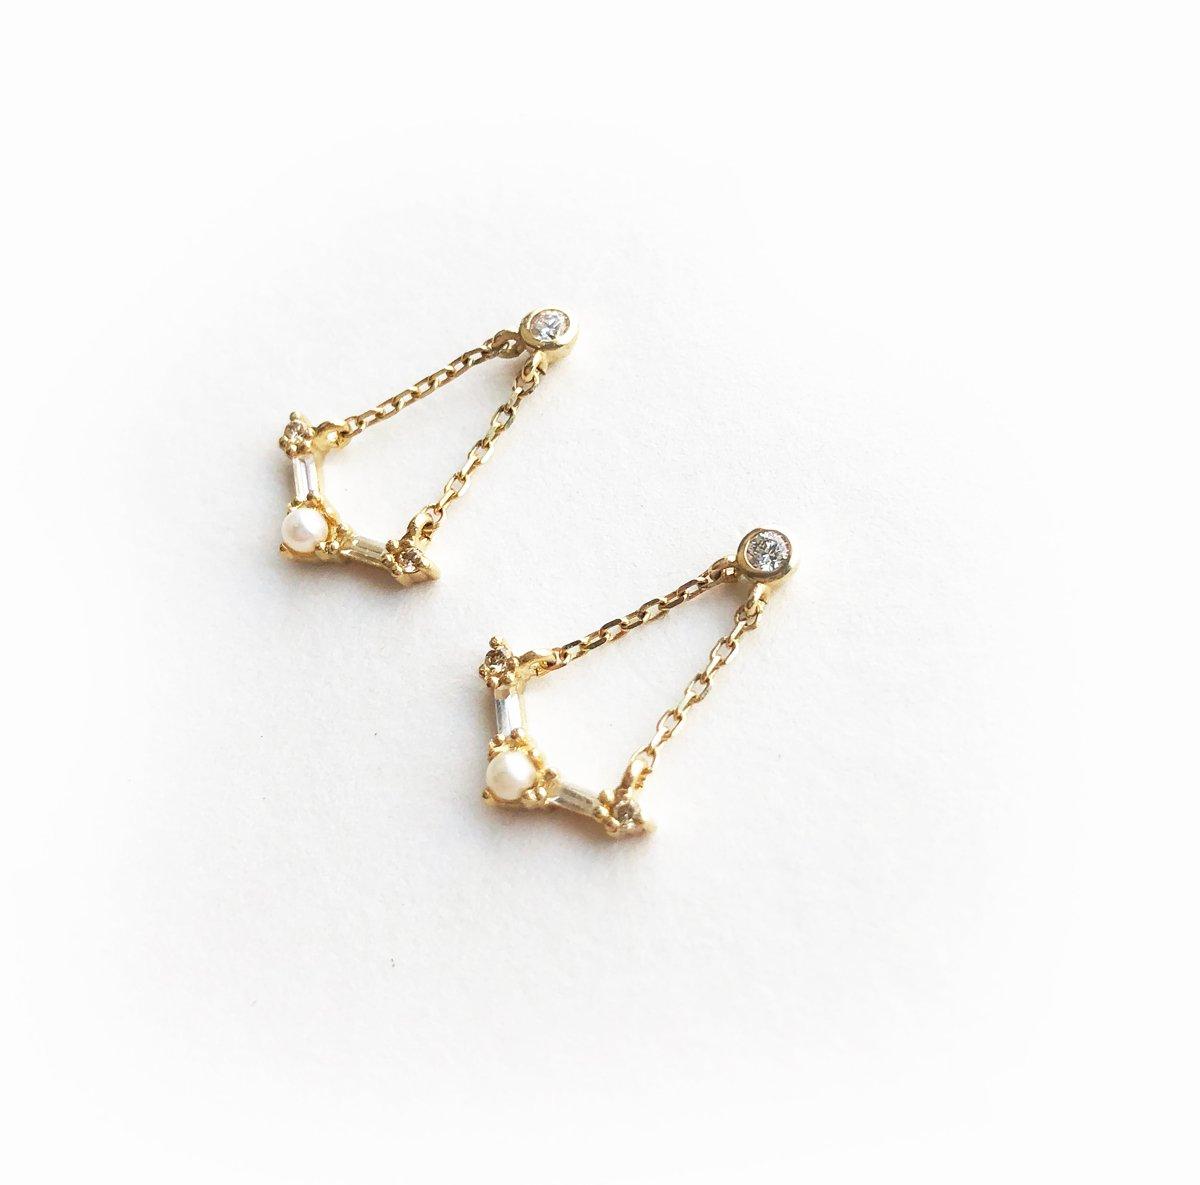 Image of Deco Chandelier Earring